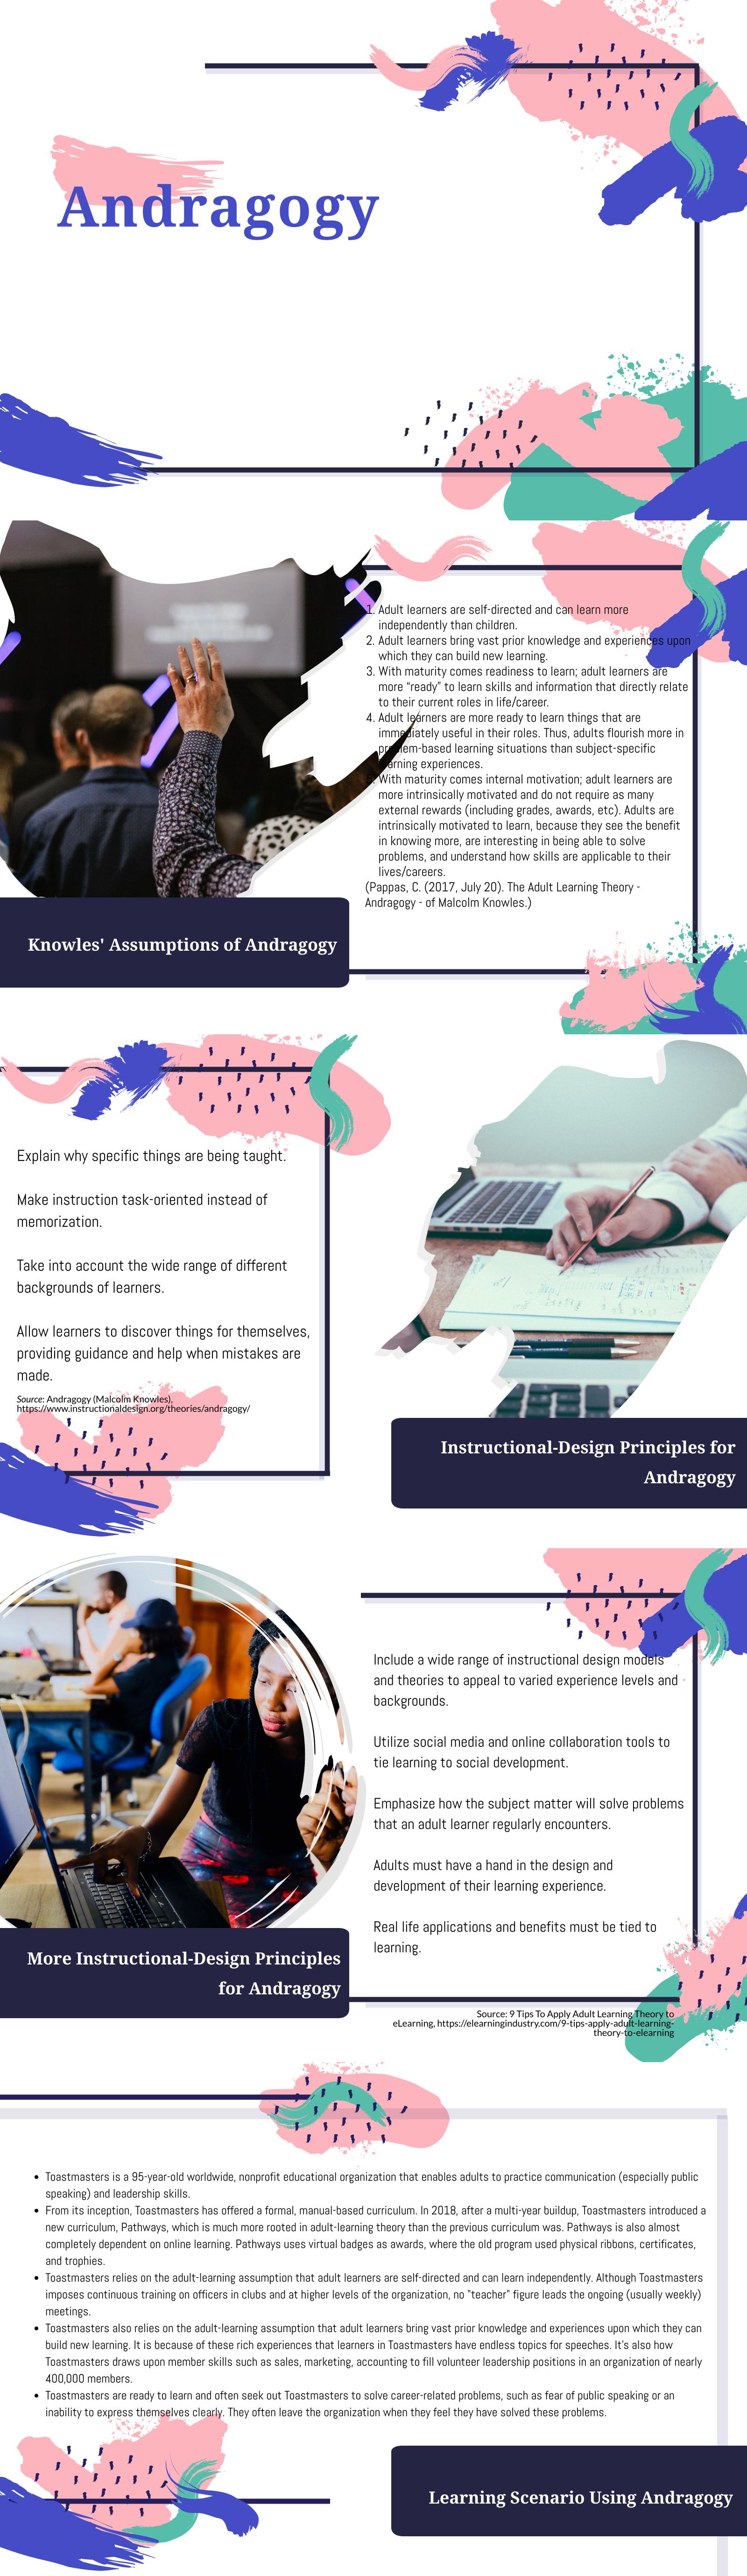 AndragogyInfographic